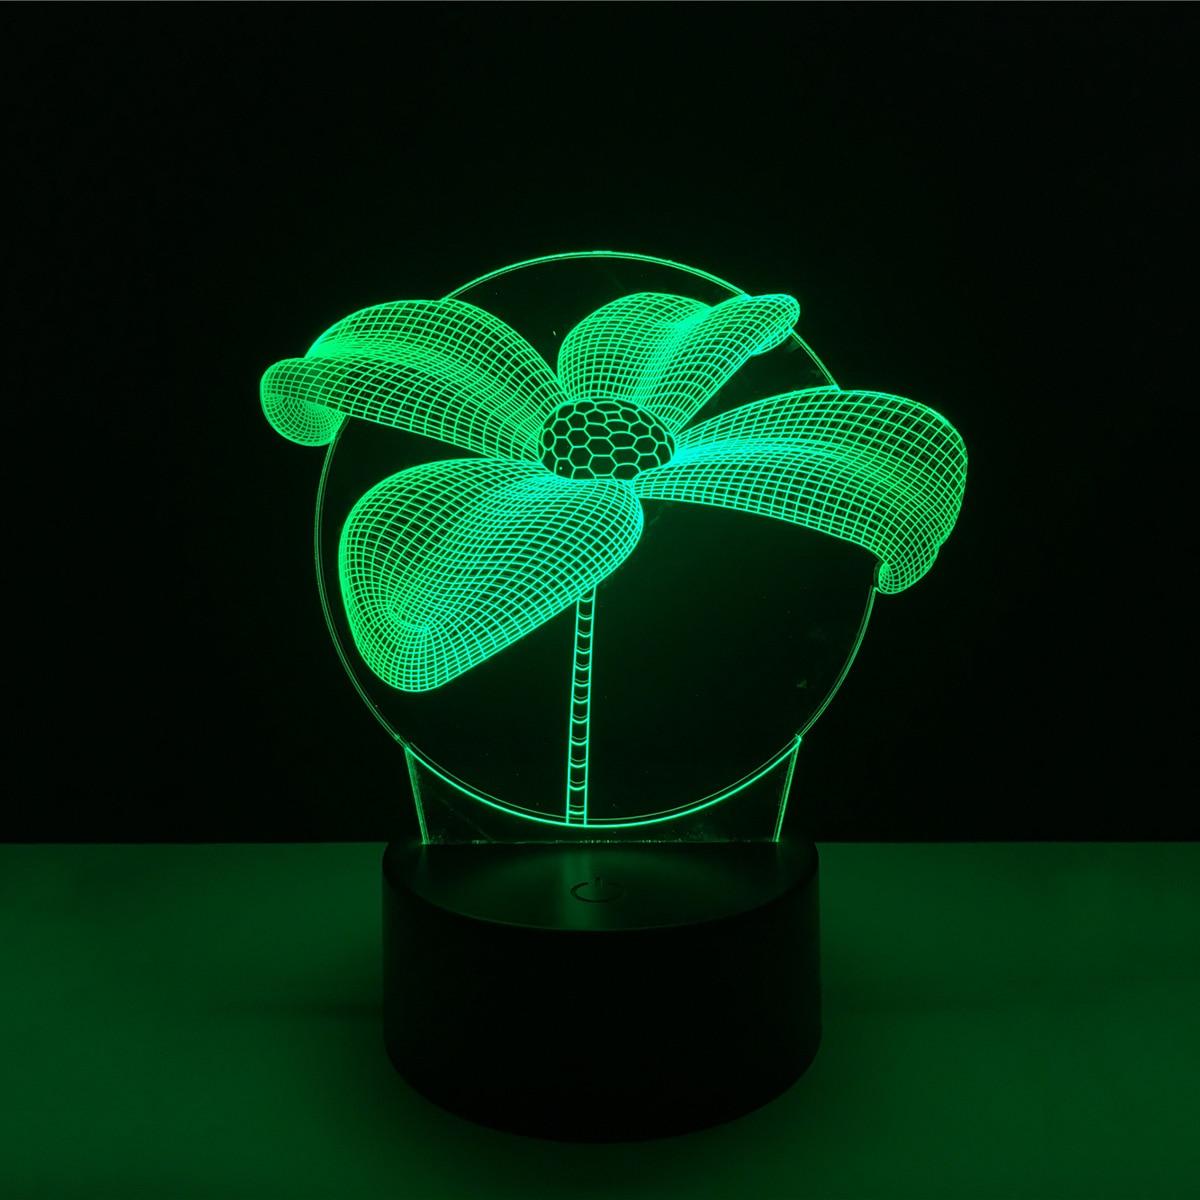 3D Lotus Acrylic LED Lamp 3D Baby Night Light Sleeping Lighting For Children Night Light Xmas New Years